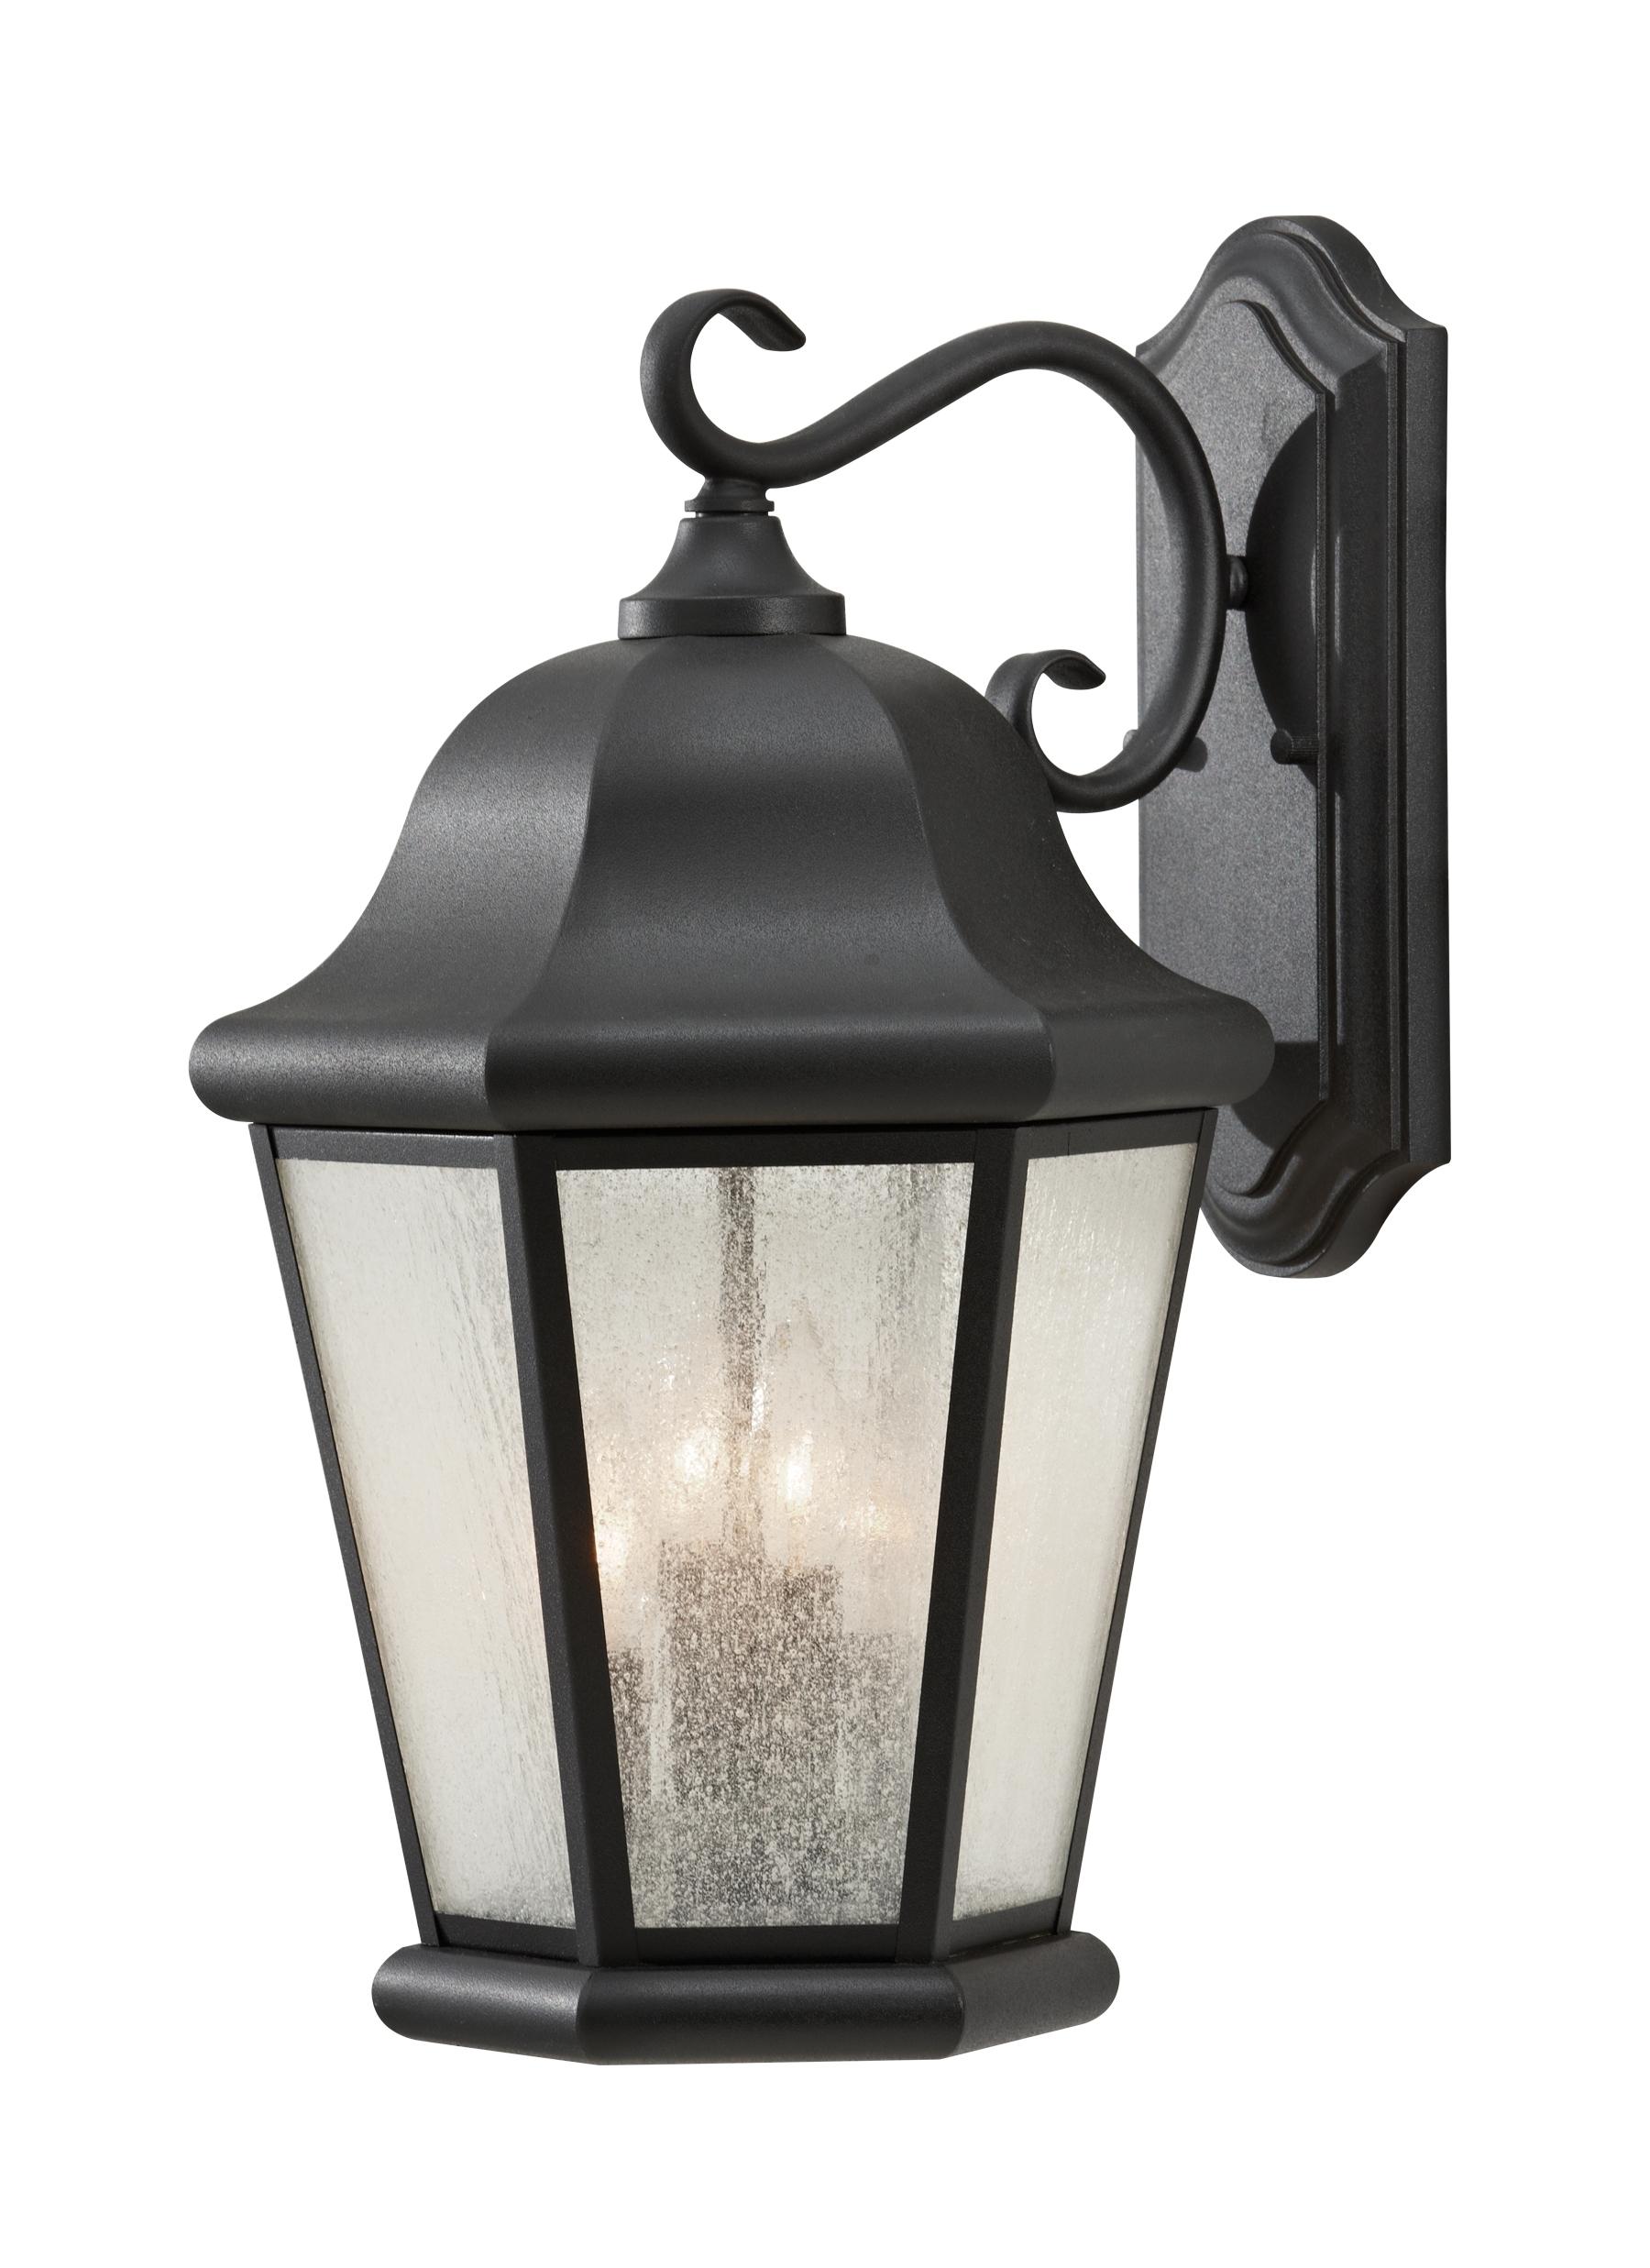 Ol5904Bk,4 Light Outdoor Lantern,black With Regard To Italian Outdoor Lanterns (View 15 of 20)